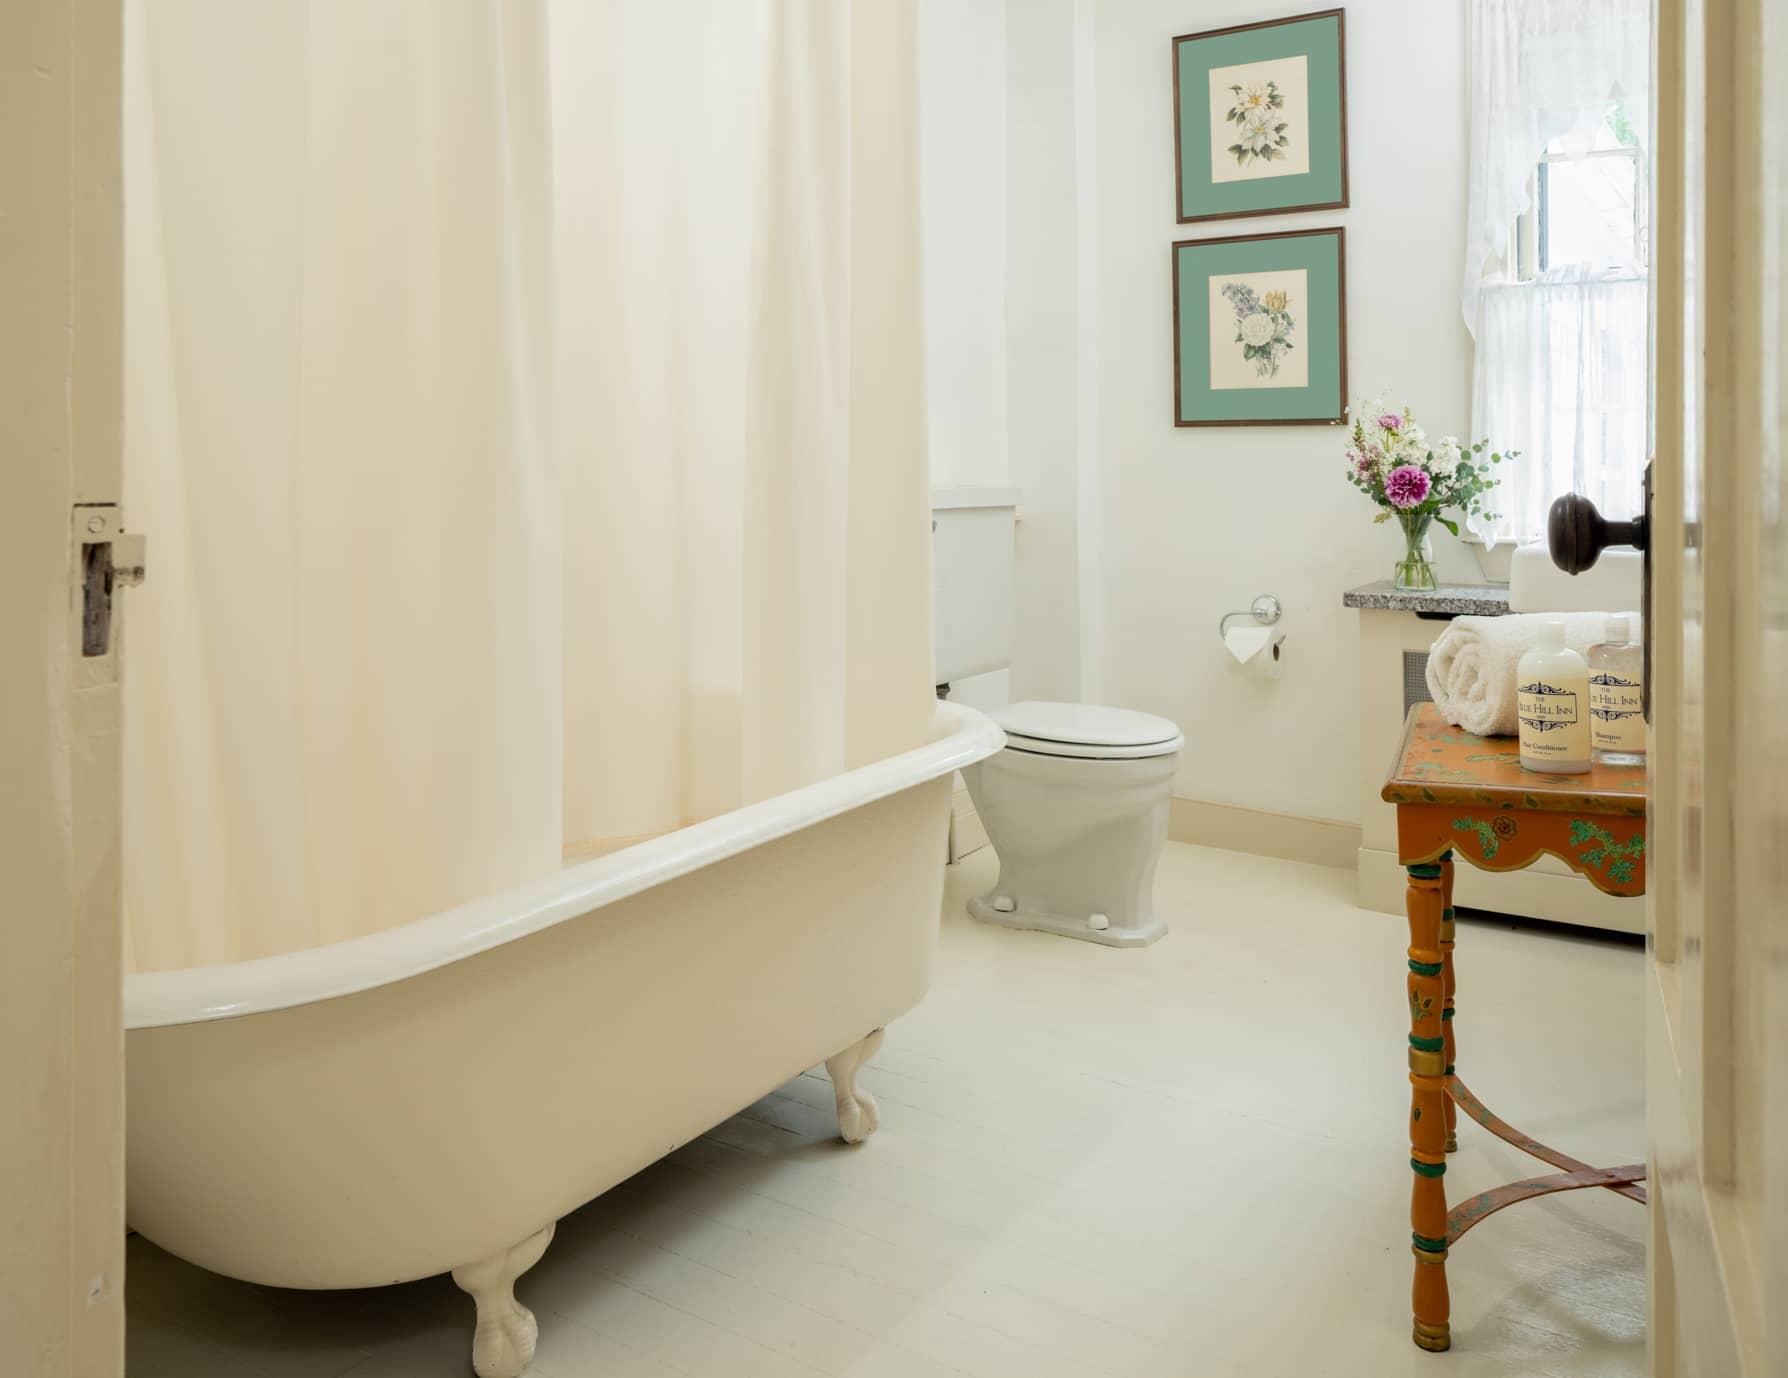 Room 3 bathroom with a antique clawfoot tub